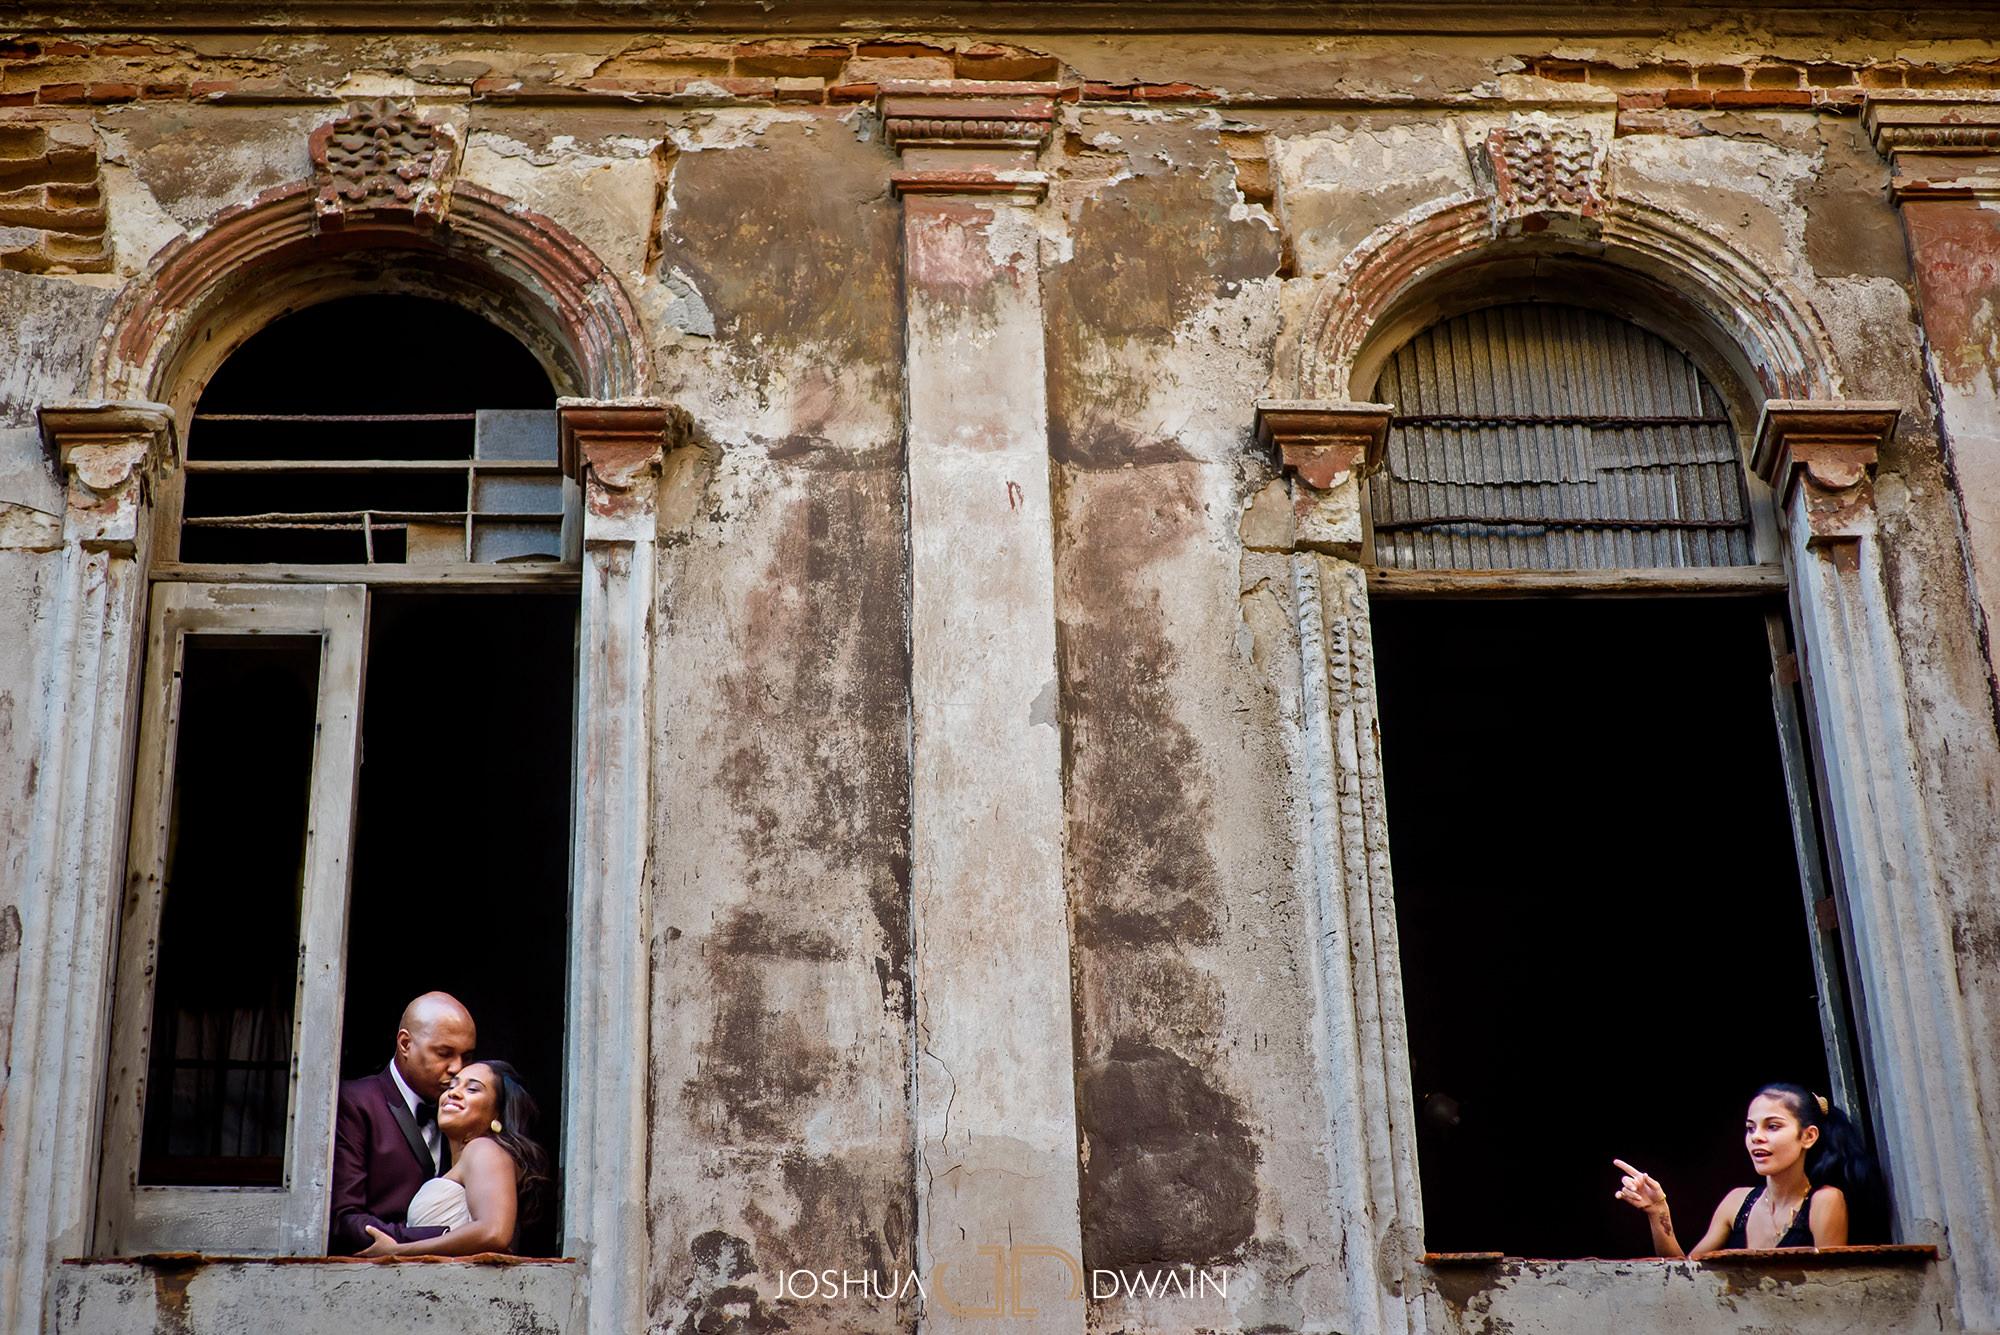 joshua-dwain-weddings-gallery-best-wedding-photographers-us-028